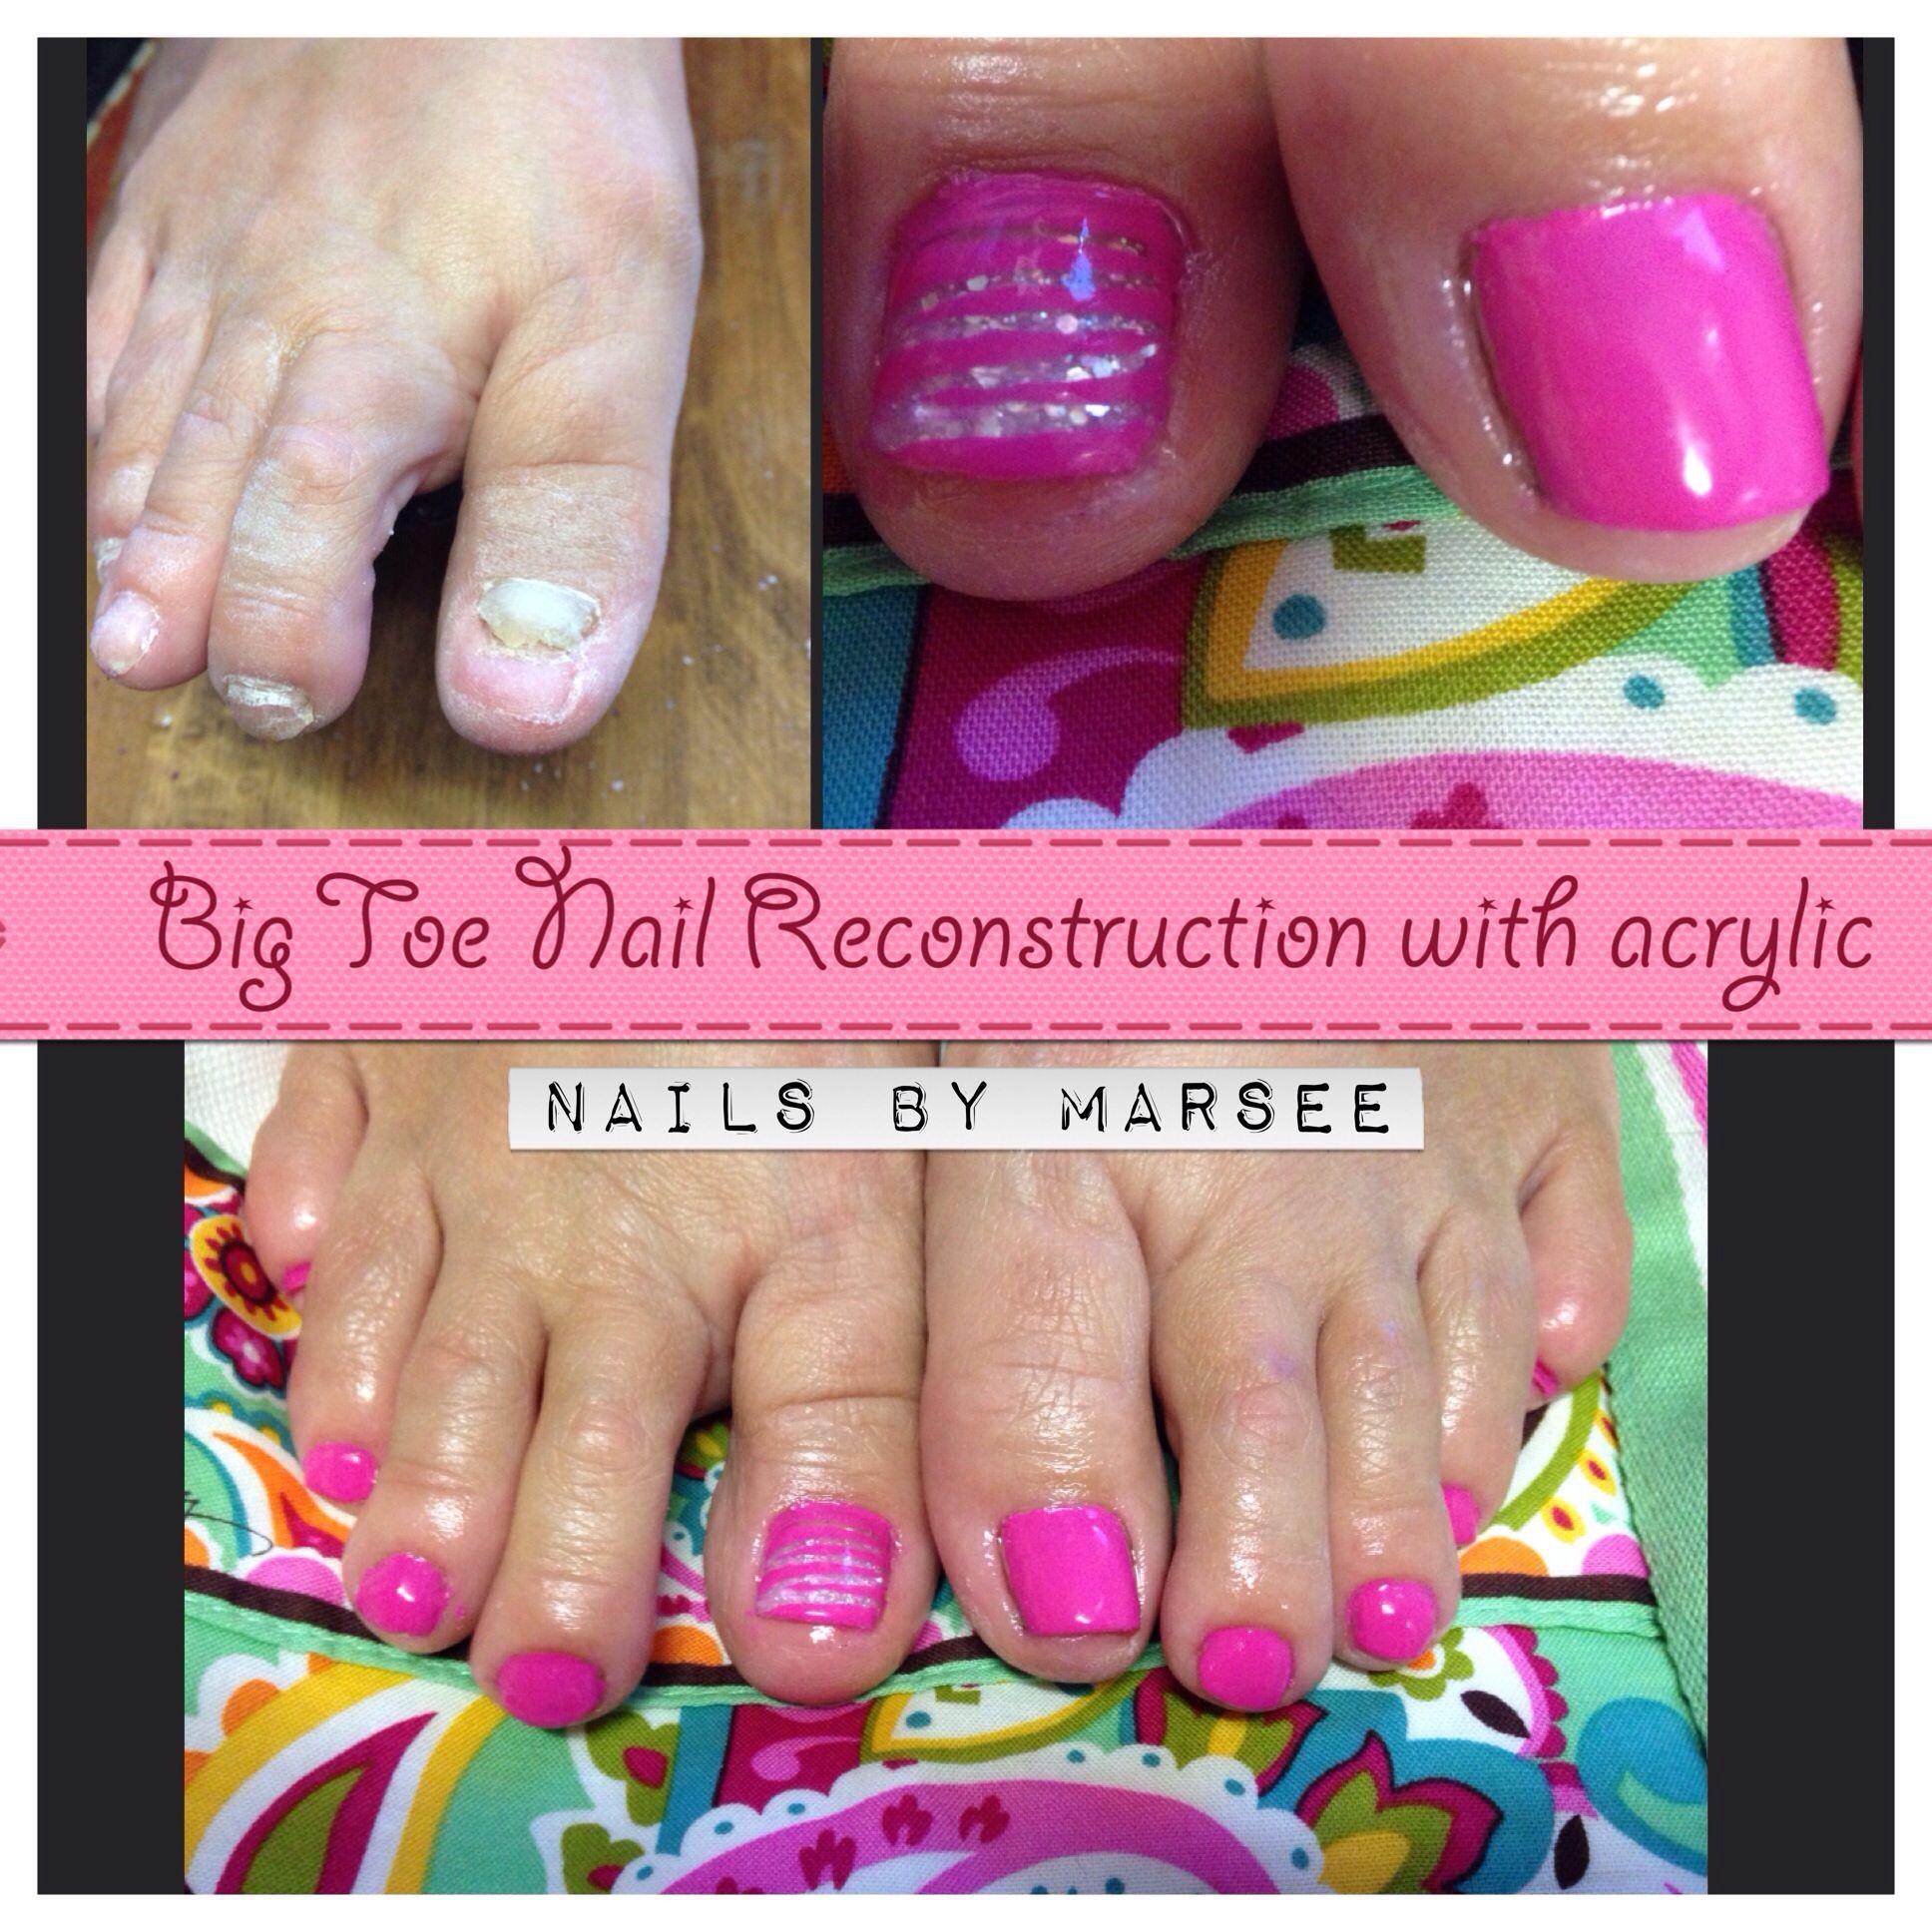 Toenail Reconstruction Toe Nails Acrylic Nails At Home Acrylic Nails